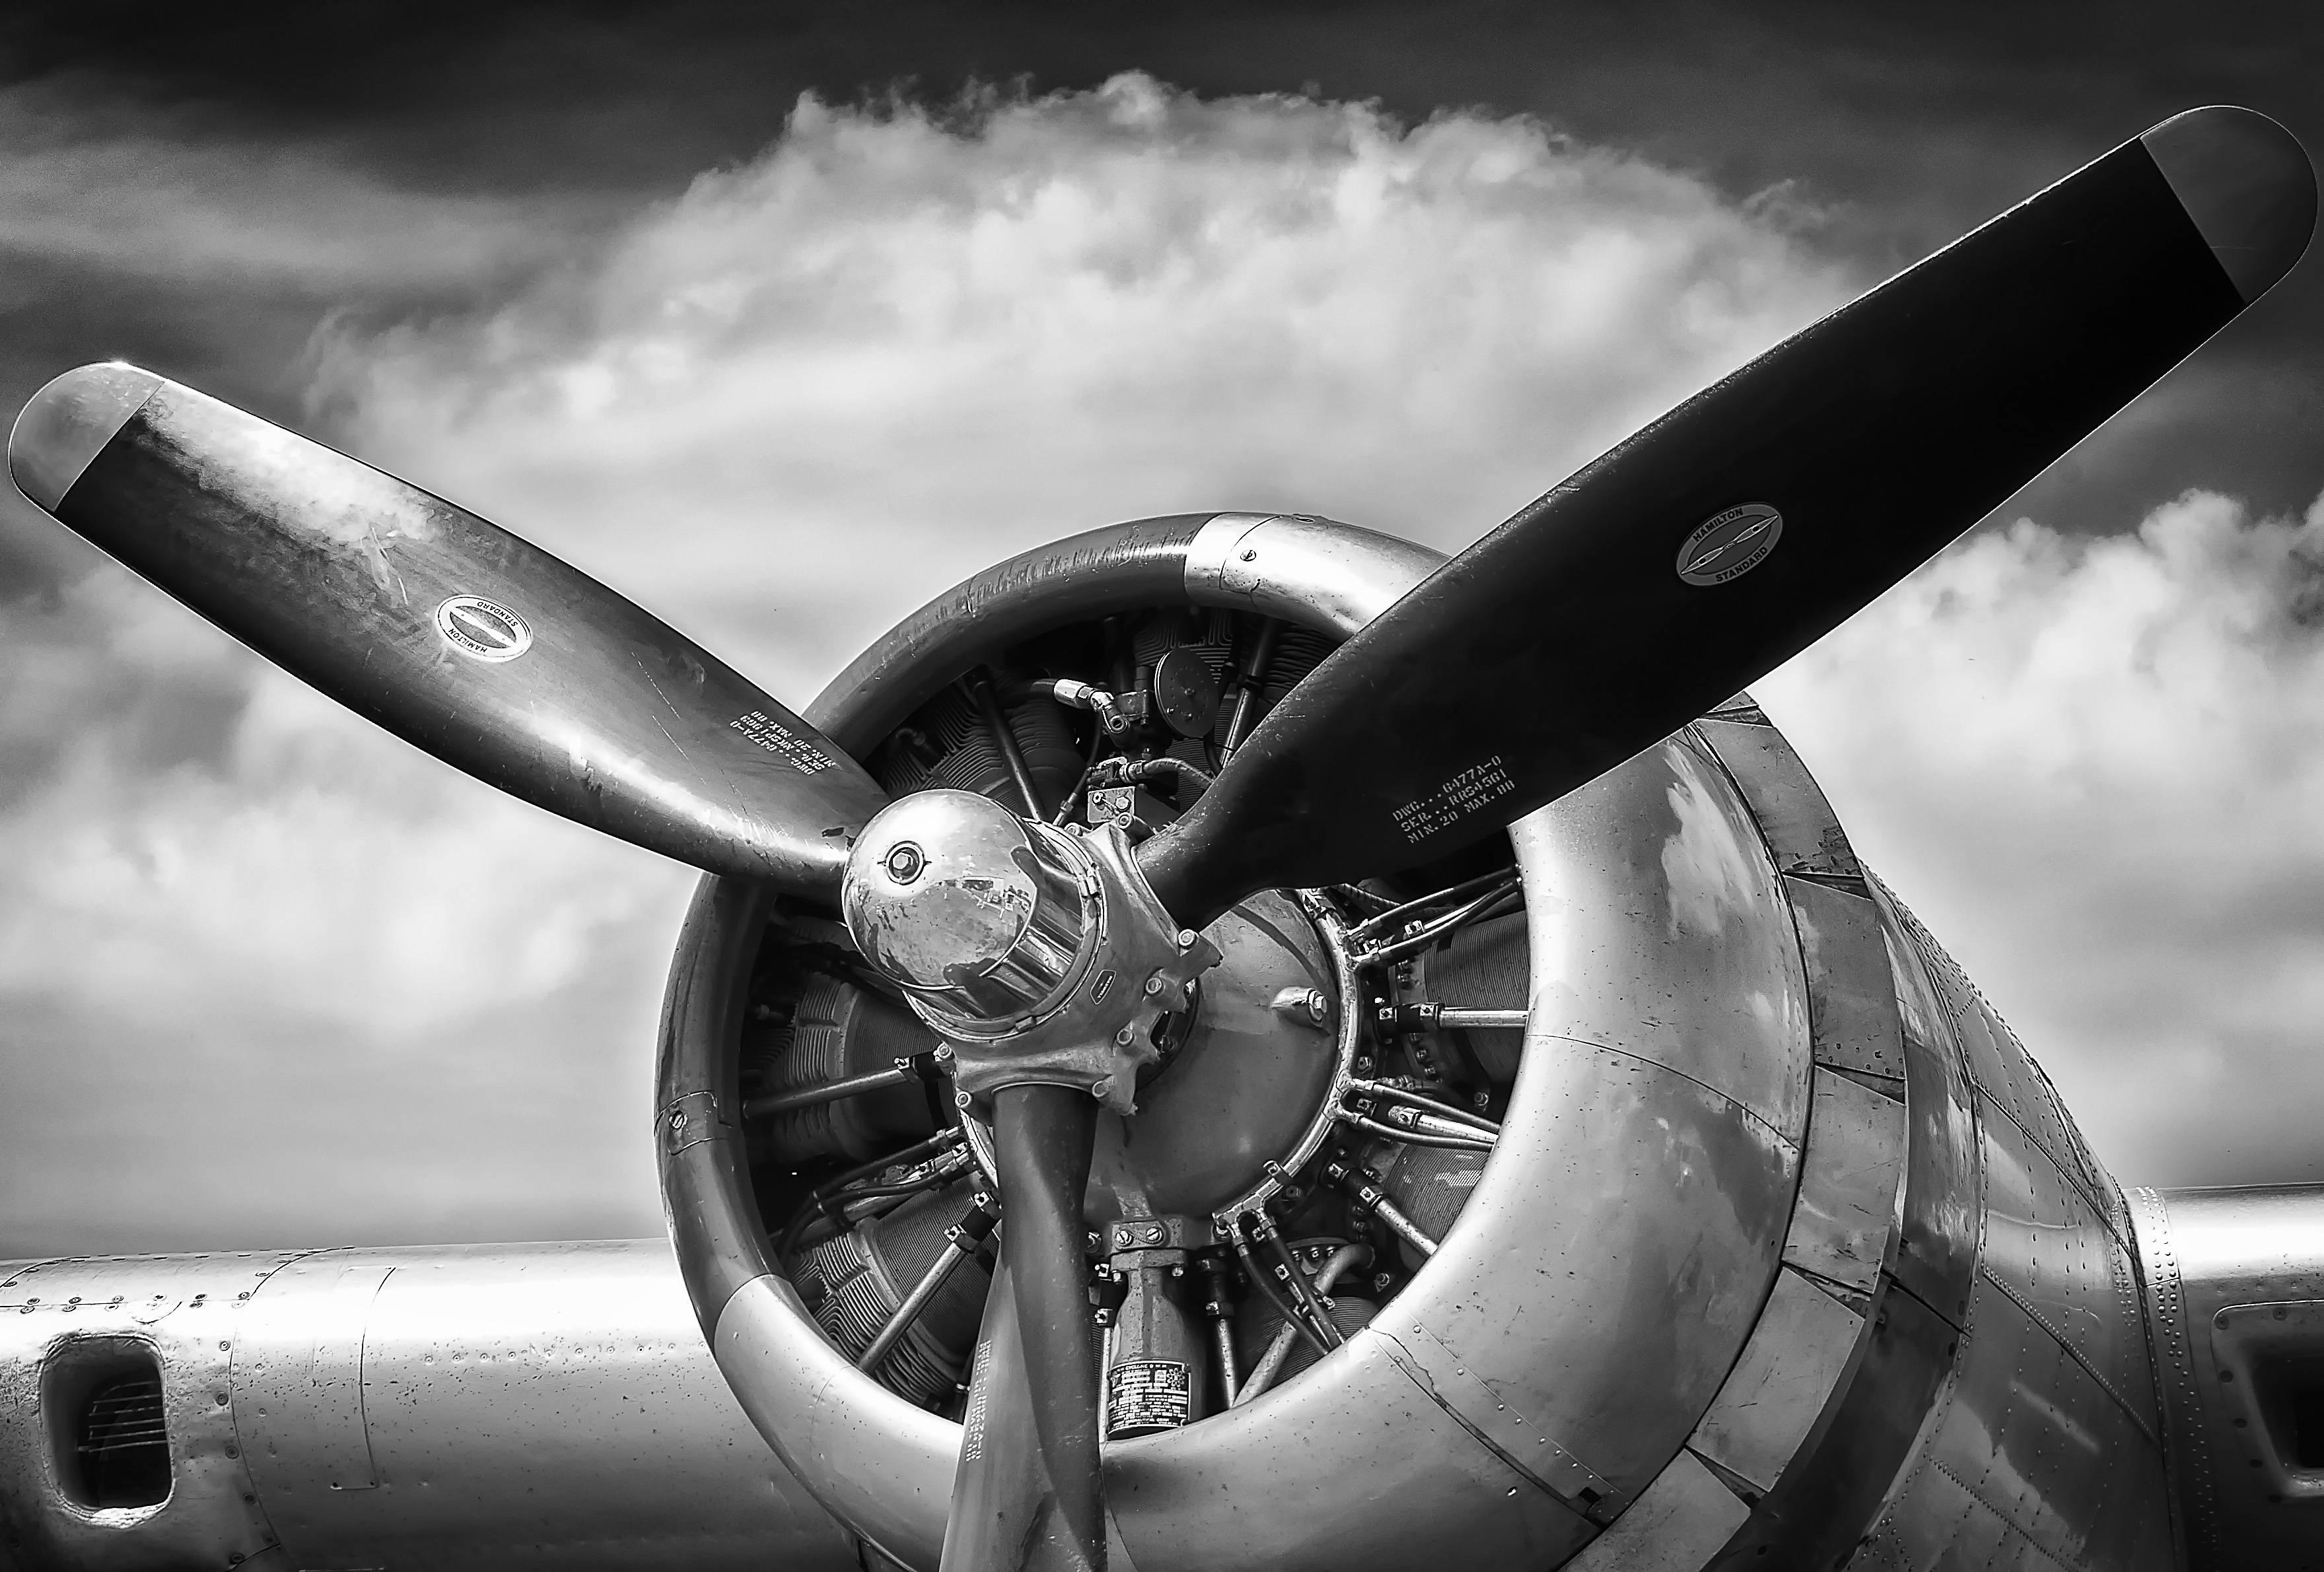 Cool Plane Propellers : World war wallpapers wallpaper cave